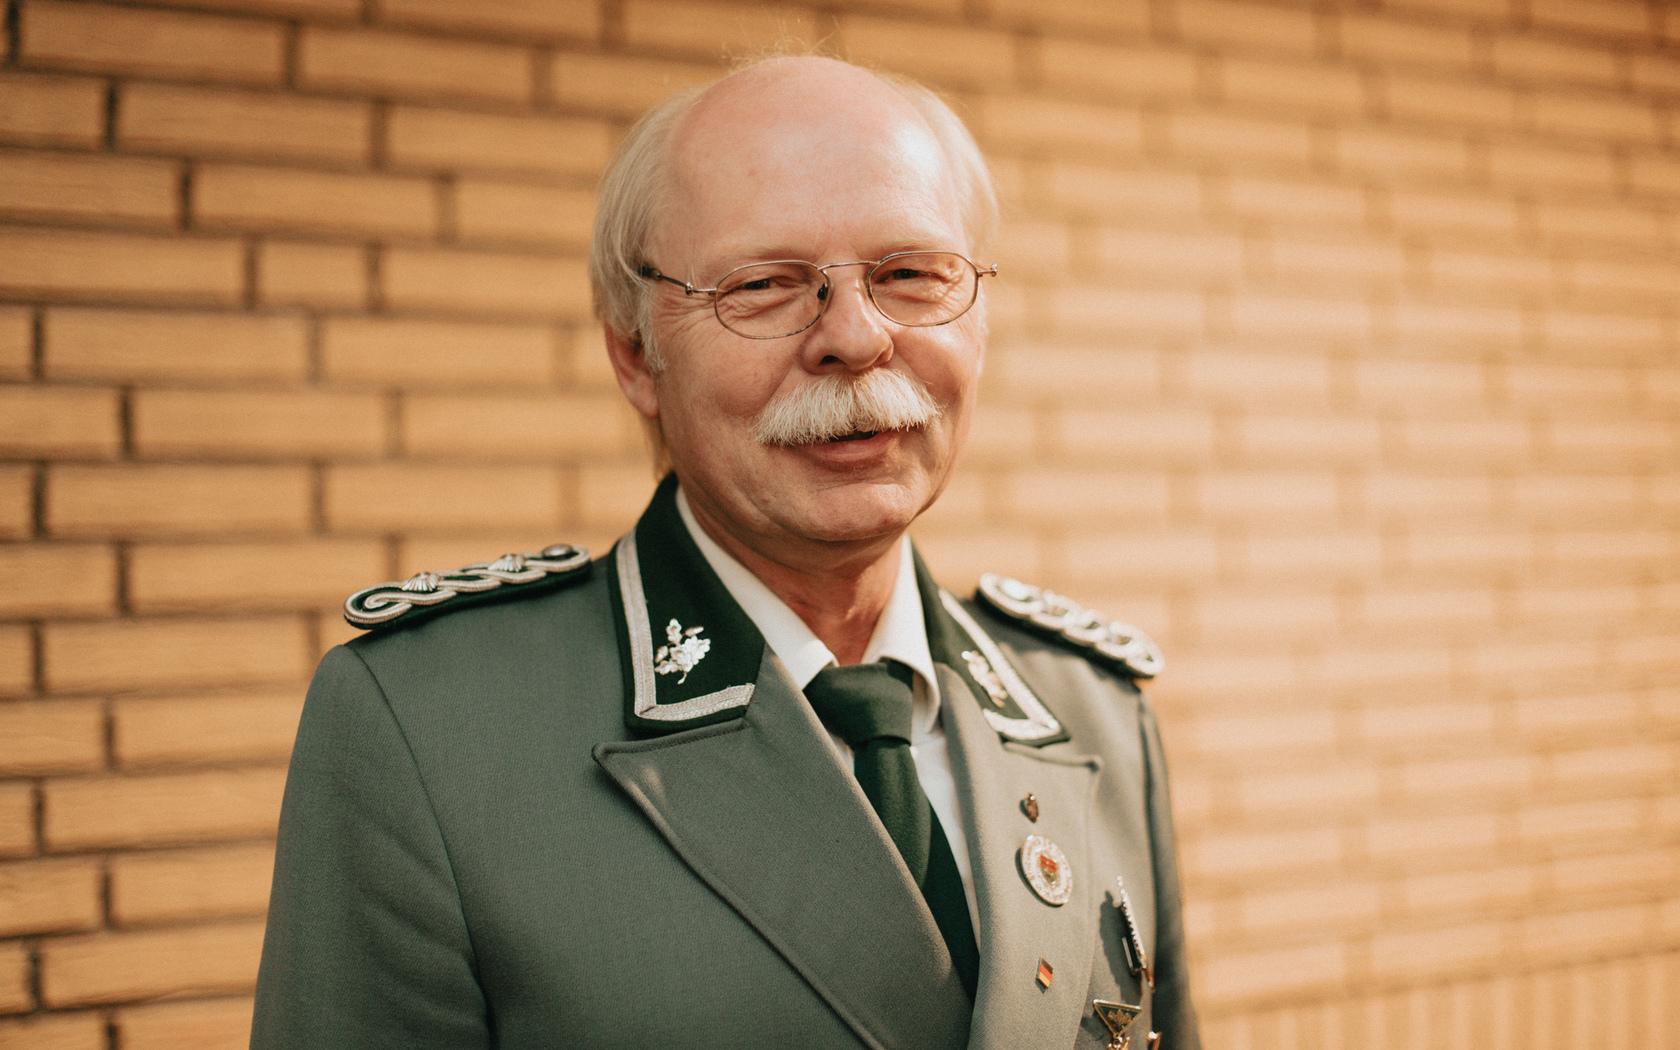 Andreas Pankoke